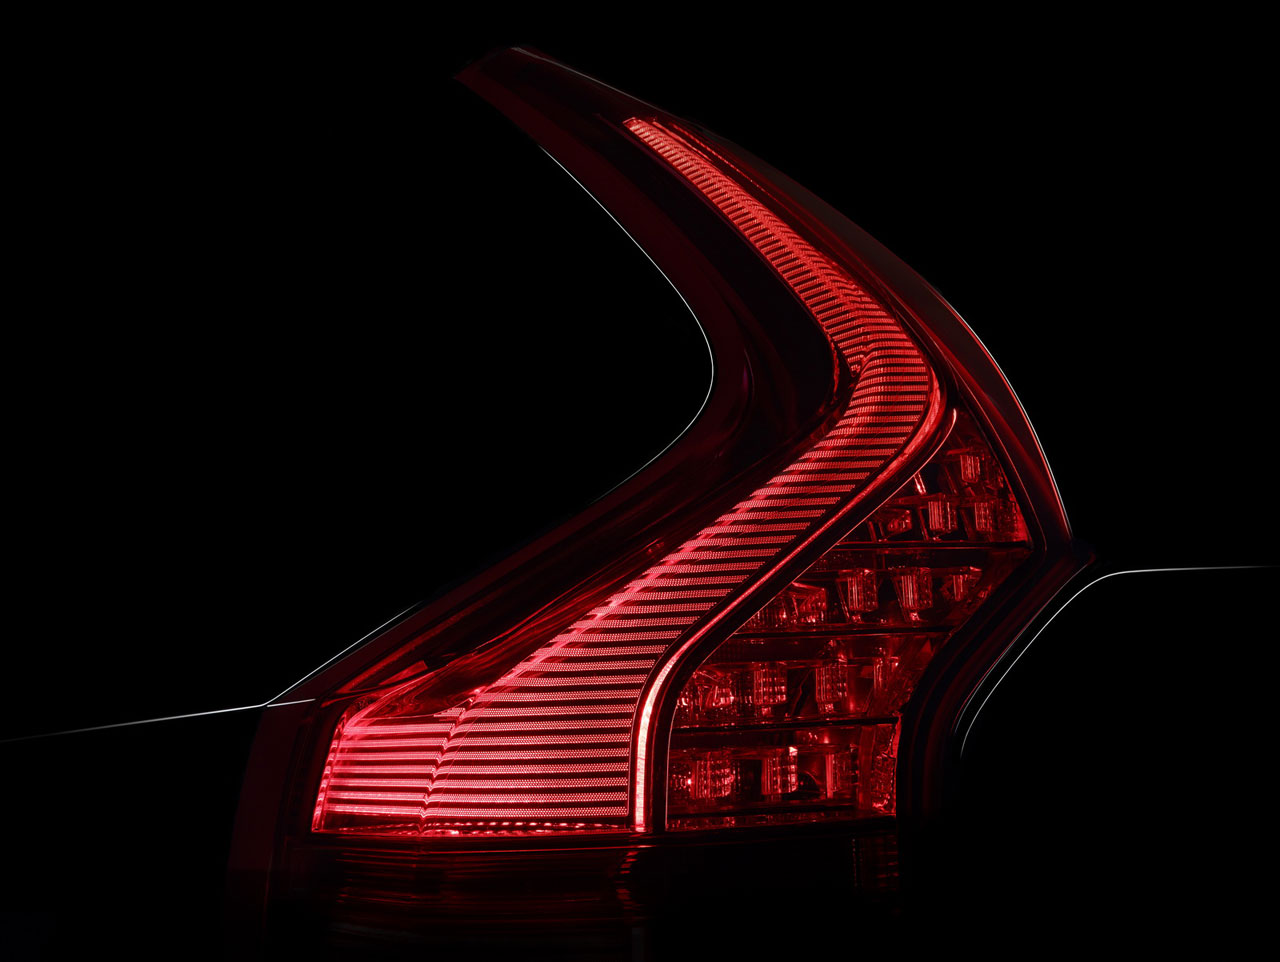 New Volvo Xc90 >> Volvo XC90 - Tail light design detail - Car Body Design